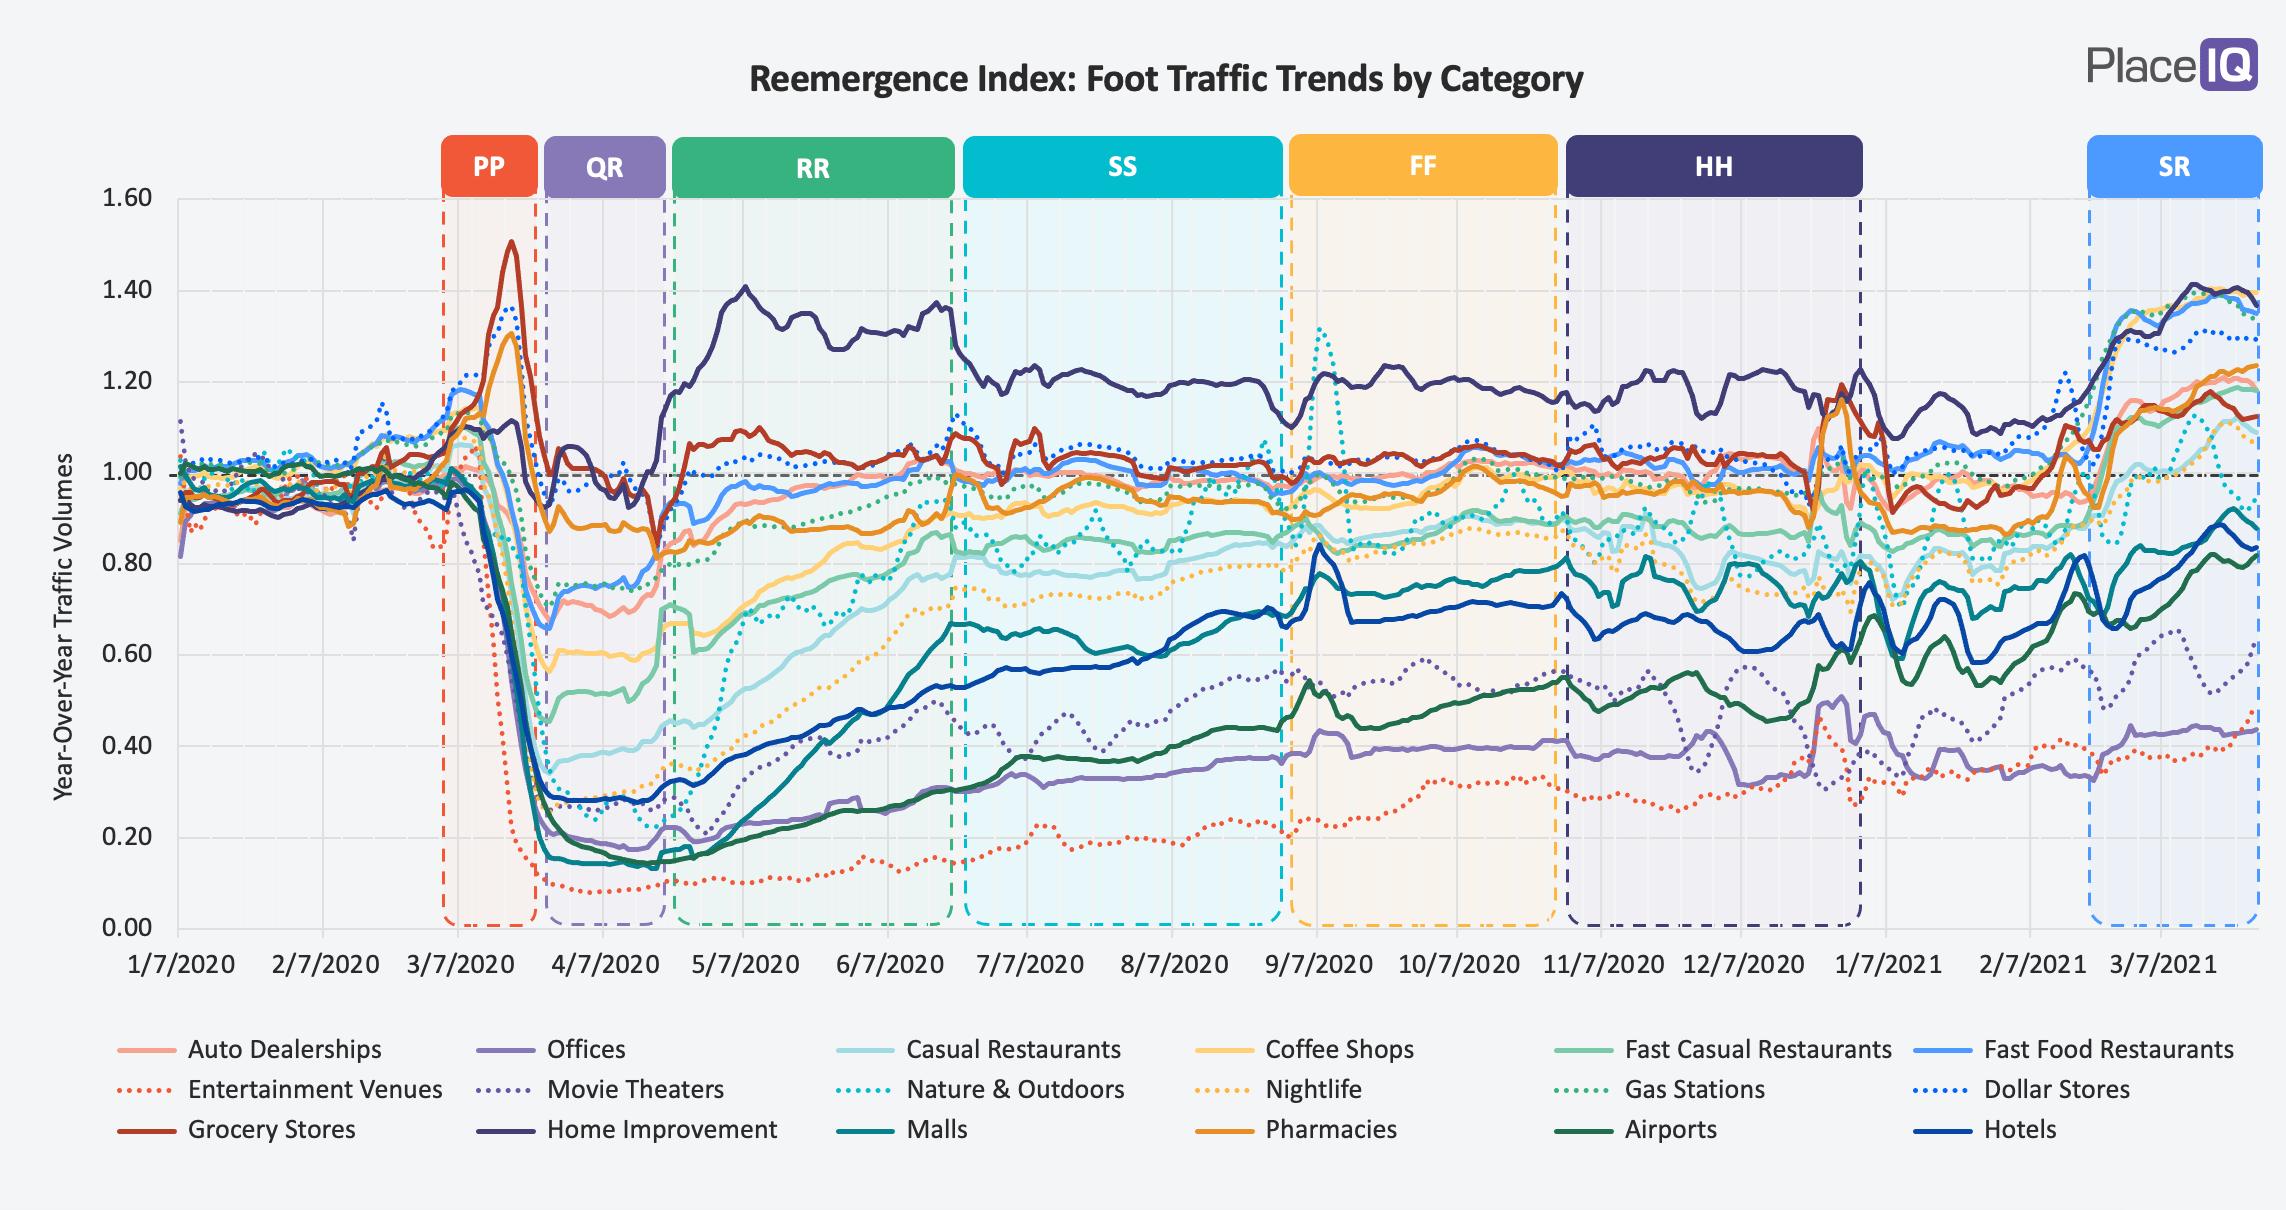 Reemergence Index